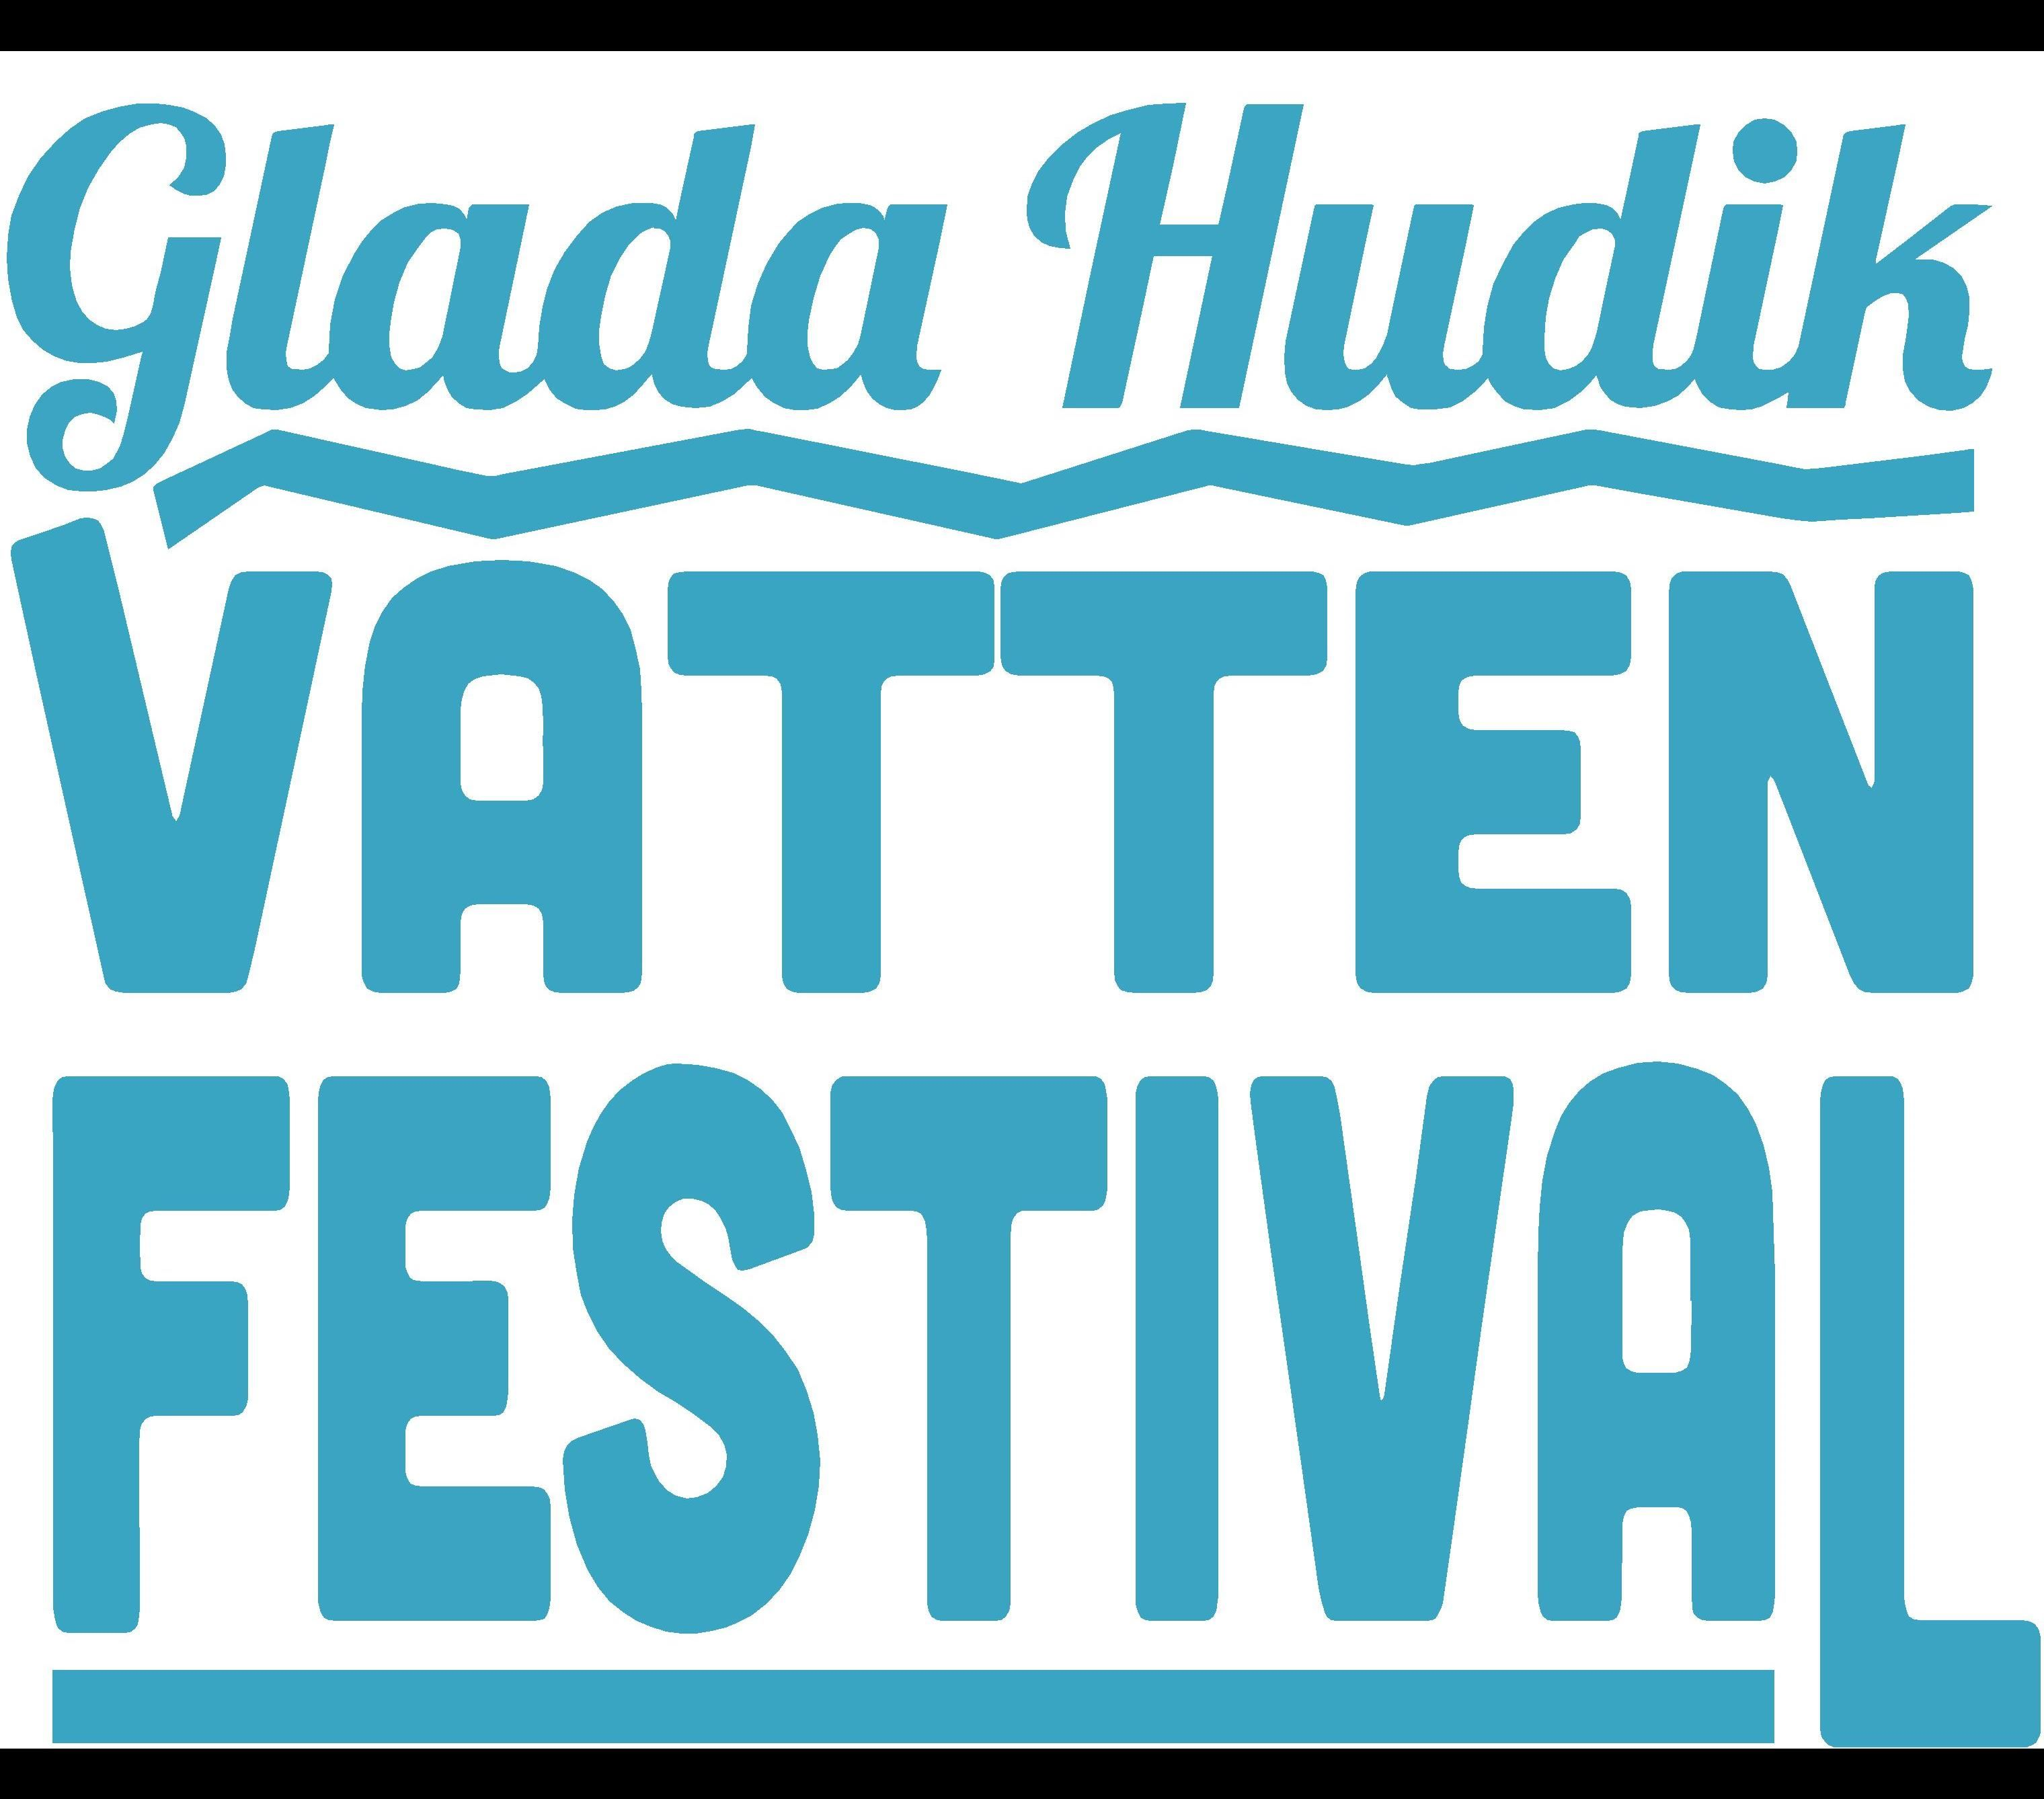 Glada Hudik Vattenfestival